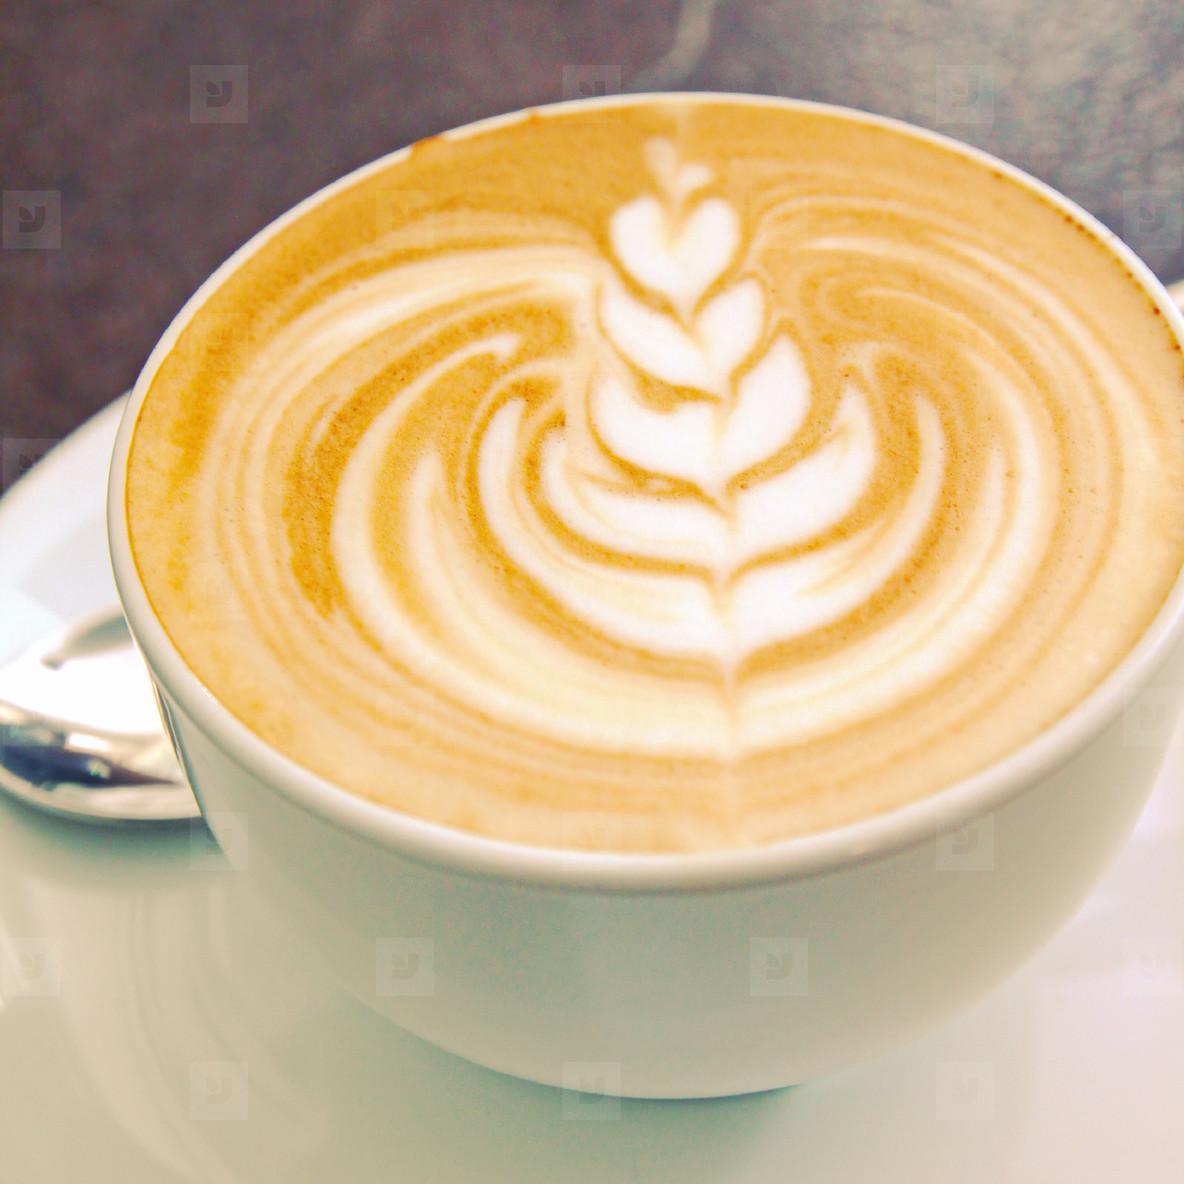 Cappuccino or latte art coffee